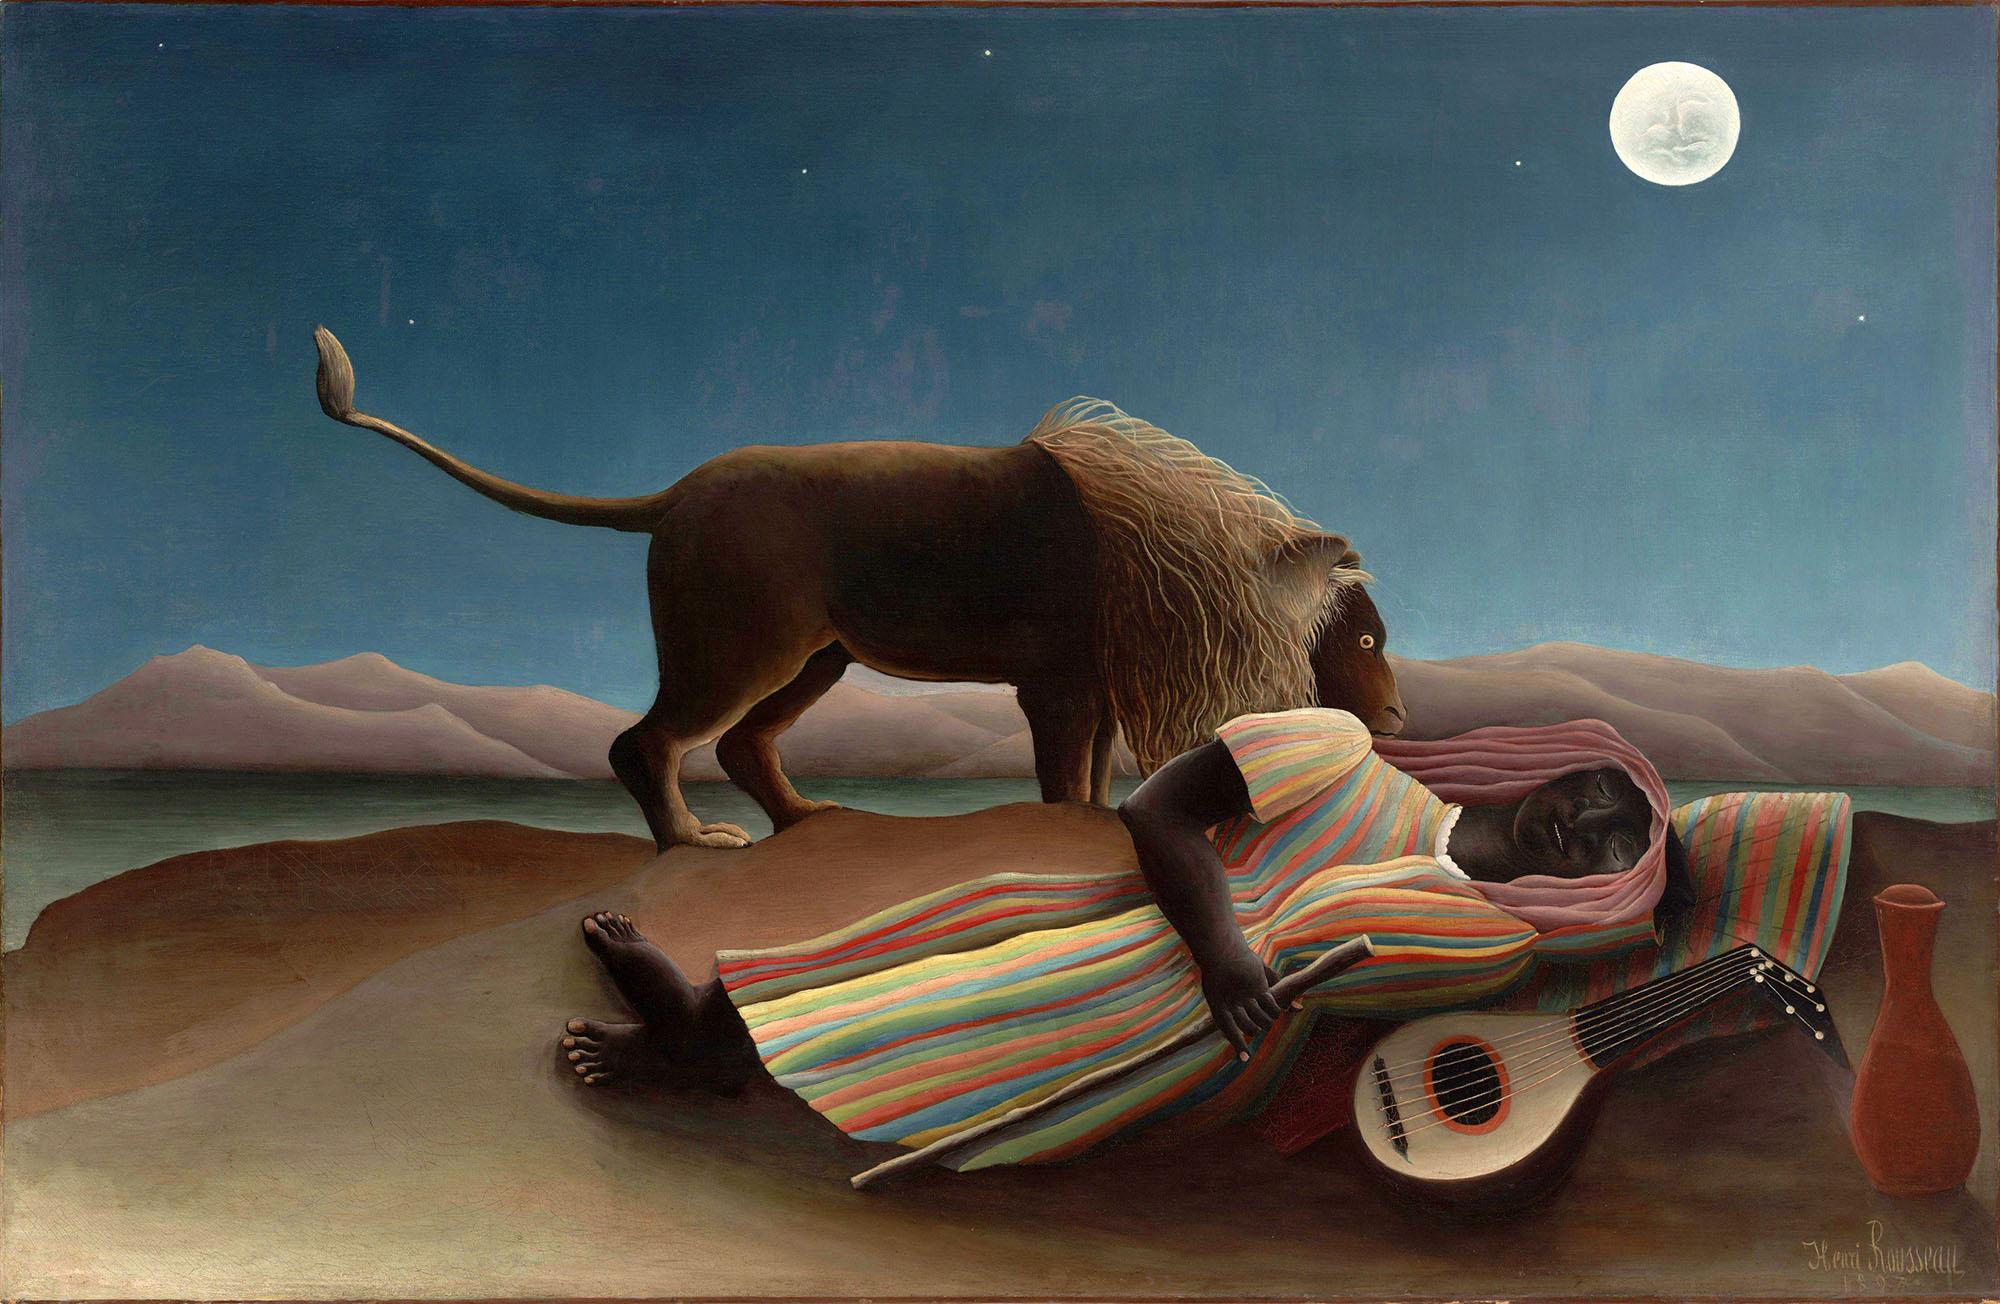 Rousseau, Henri. The Sleeping Gypsy . 1897. Museum of Modern Art,New York, NY.